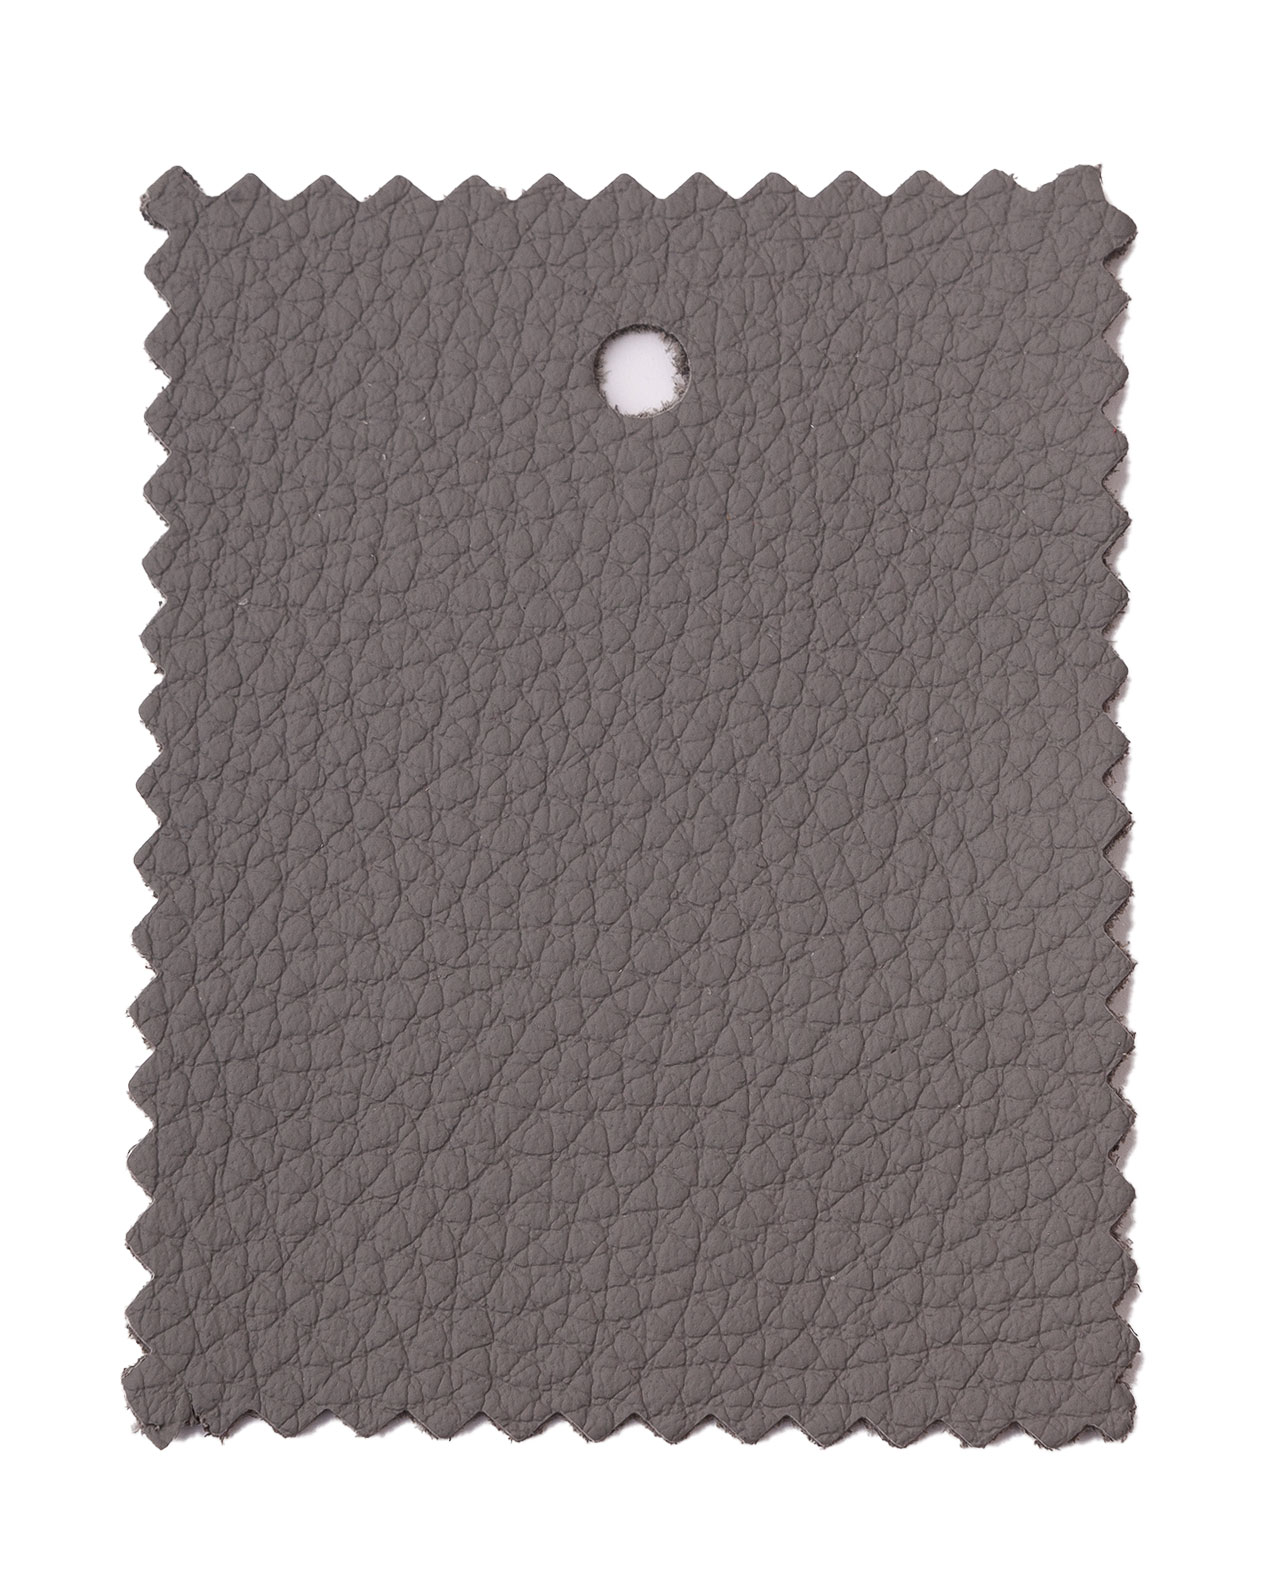 Abbildung bmw-dakota-grau